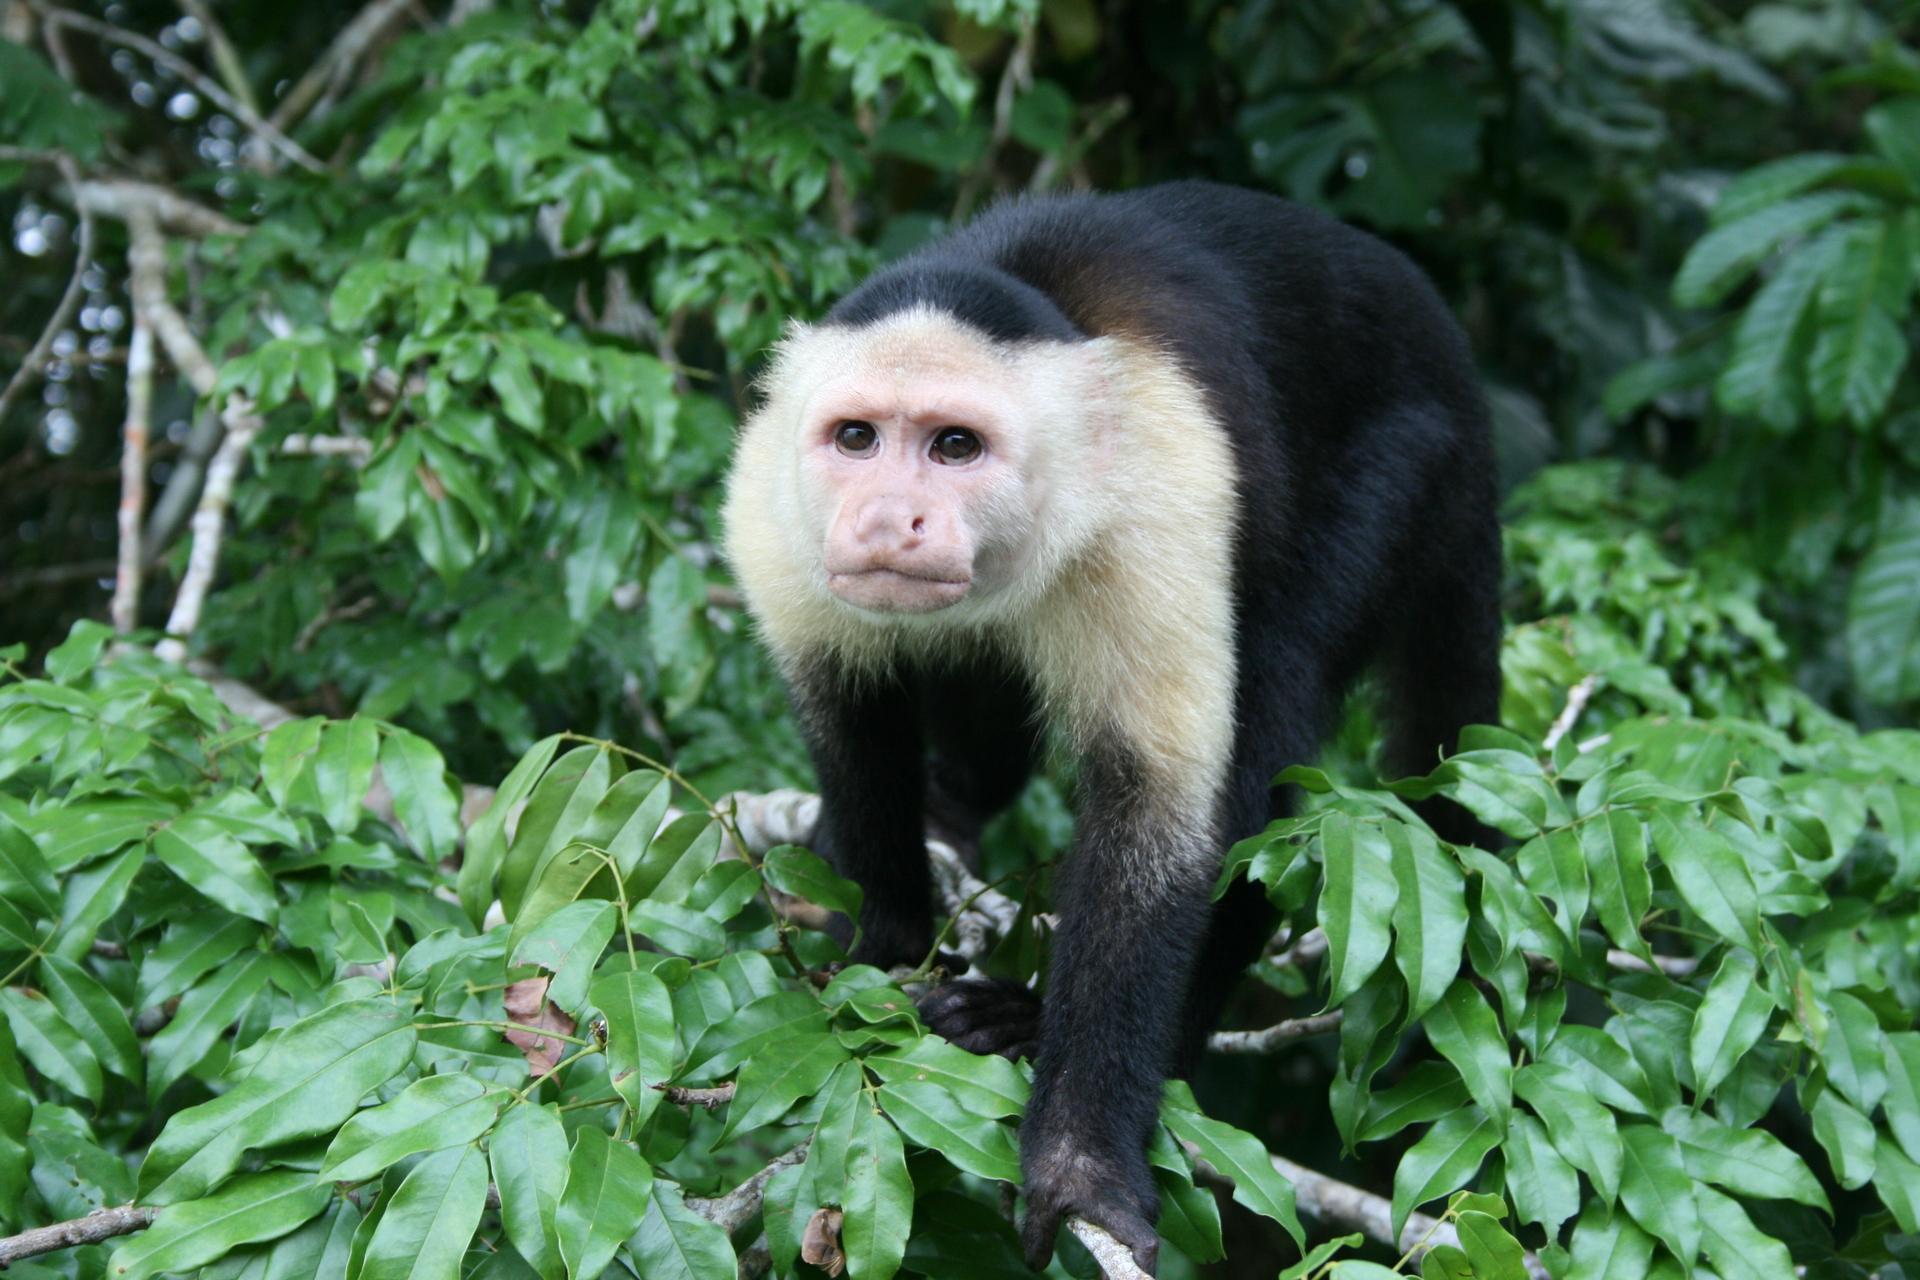 Panama wildlife, sanctuary, nature